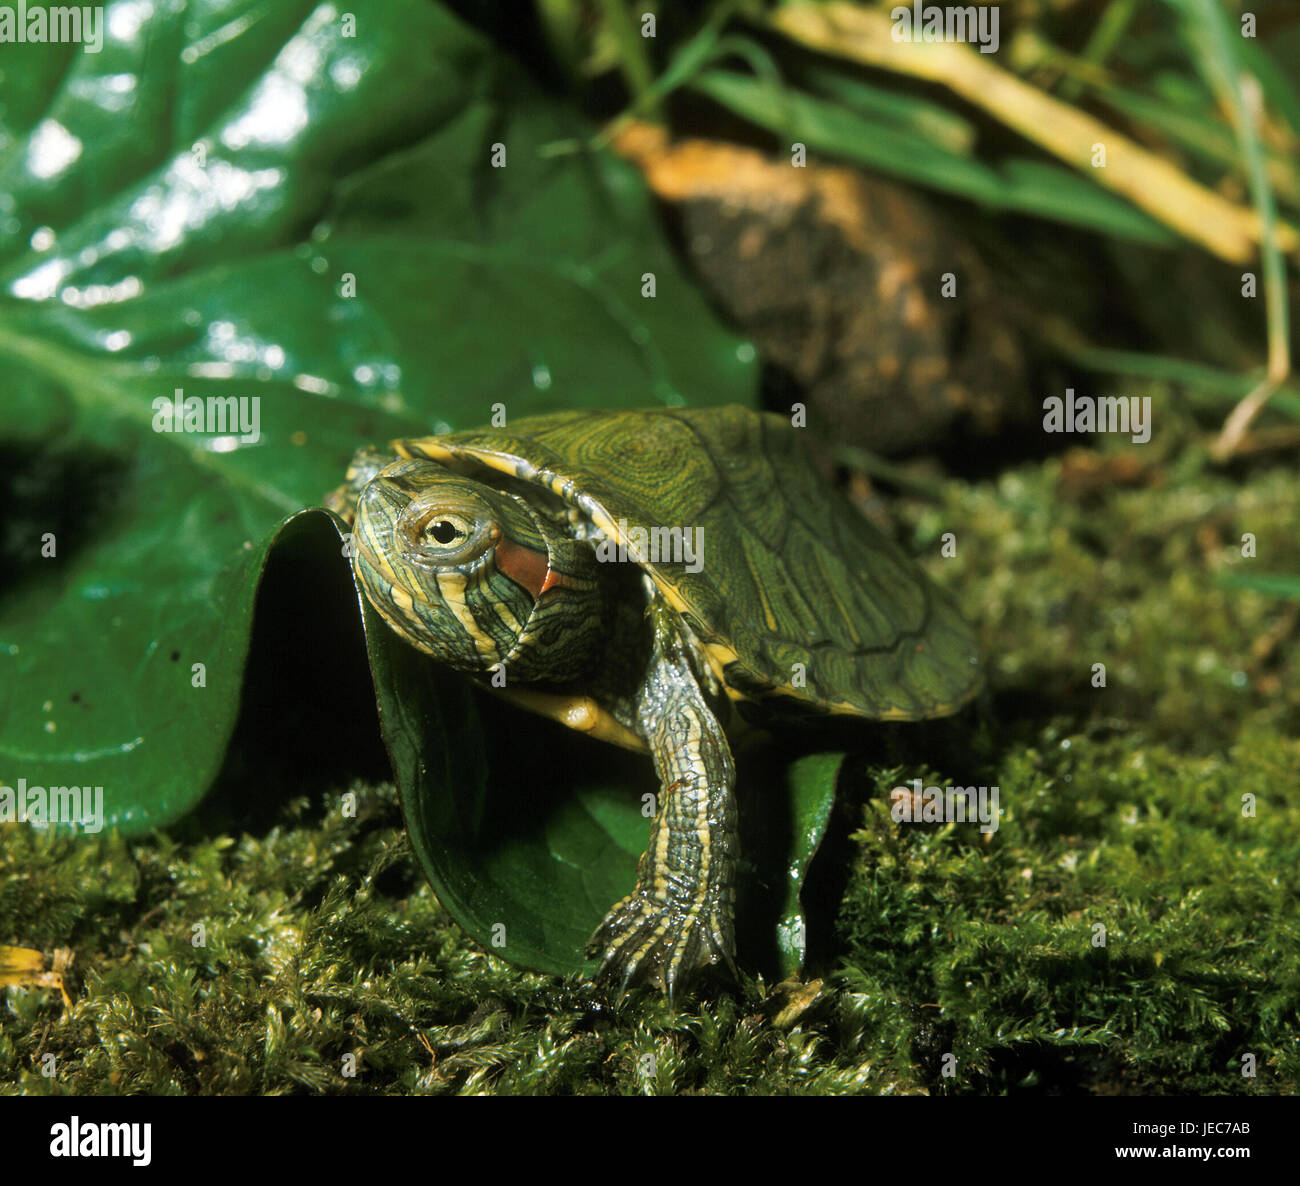 Red cheeks-jewellery tortoise, Trachemys scripta elegans, - Stock Image